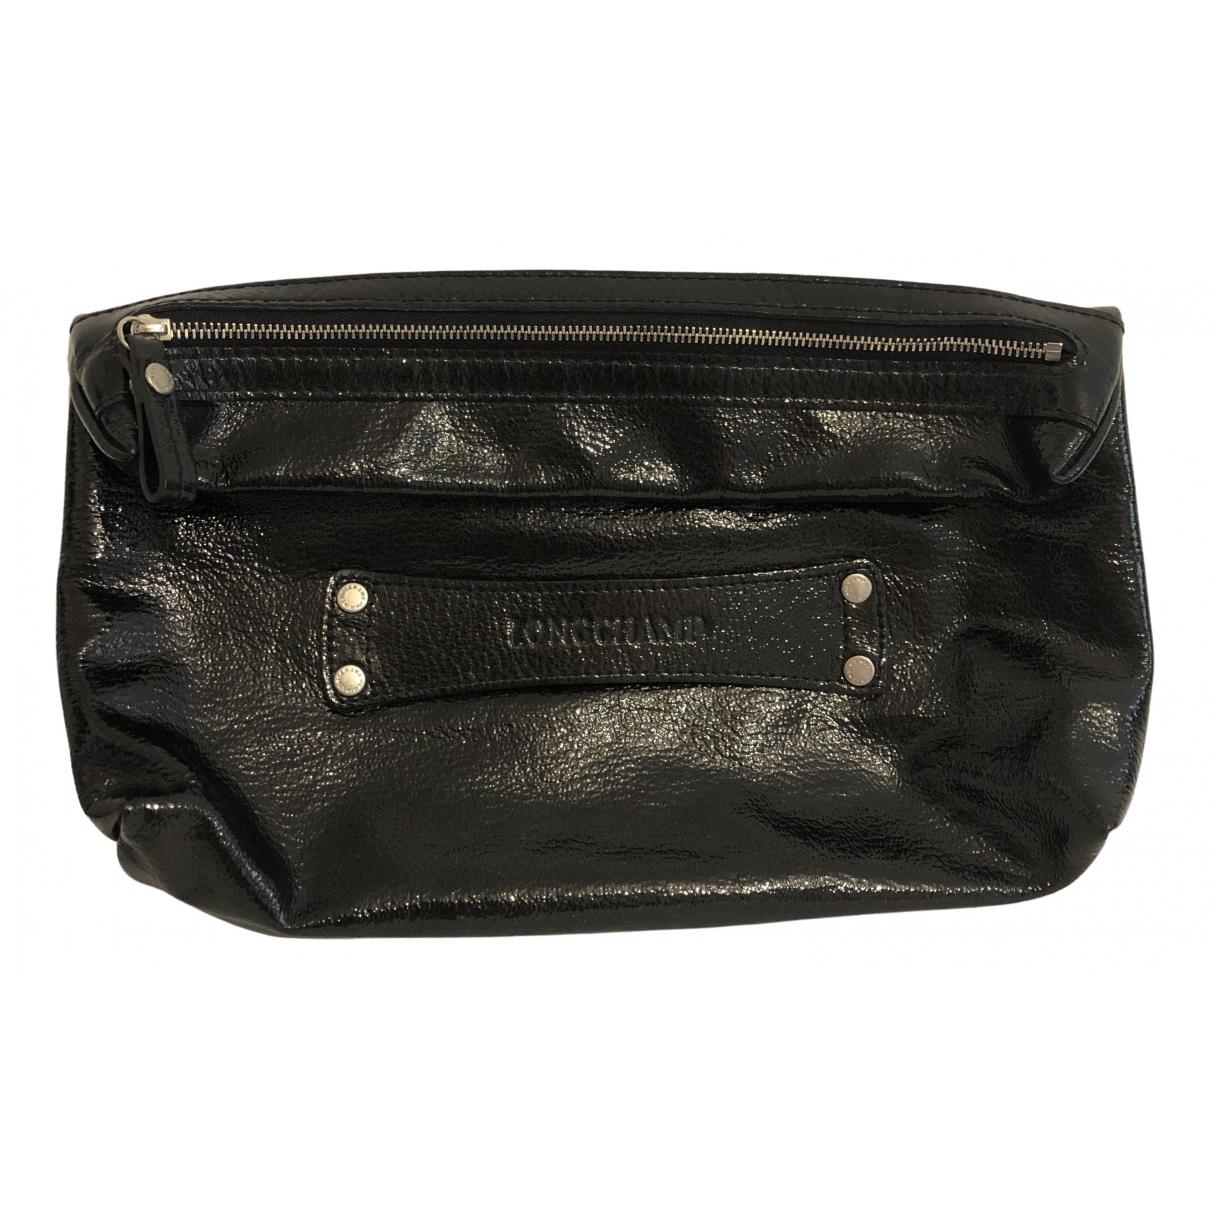 Longchamp \N Clutch in  Schwarz Lackleder